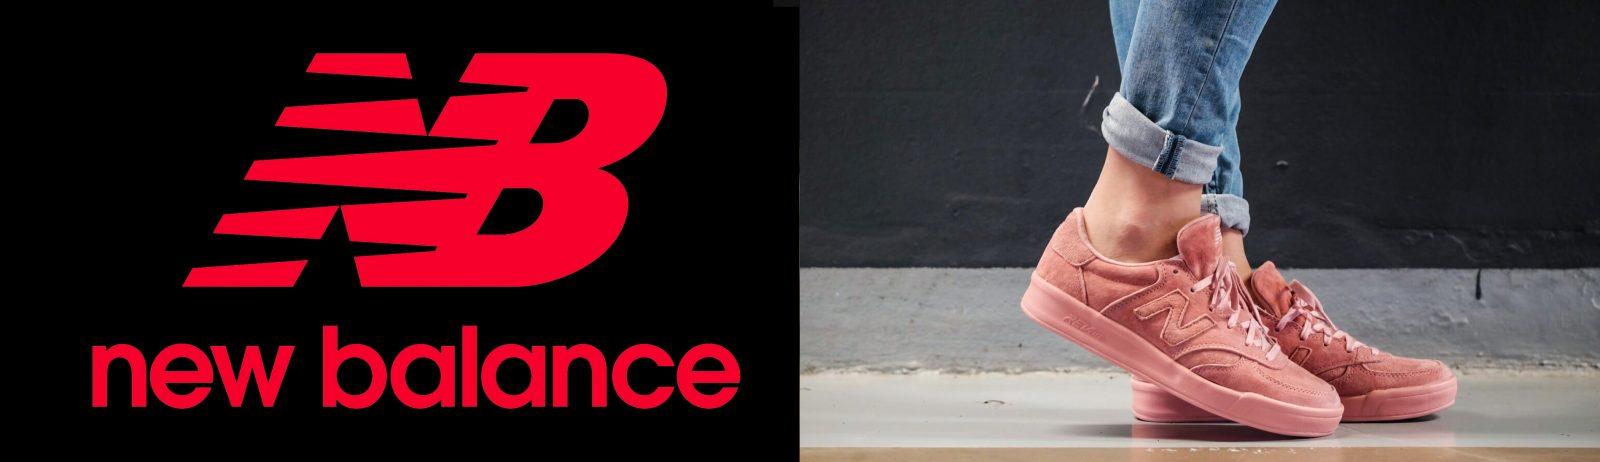 Women's New Balance Trainers